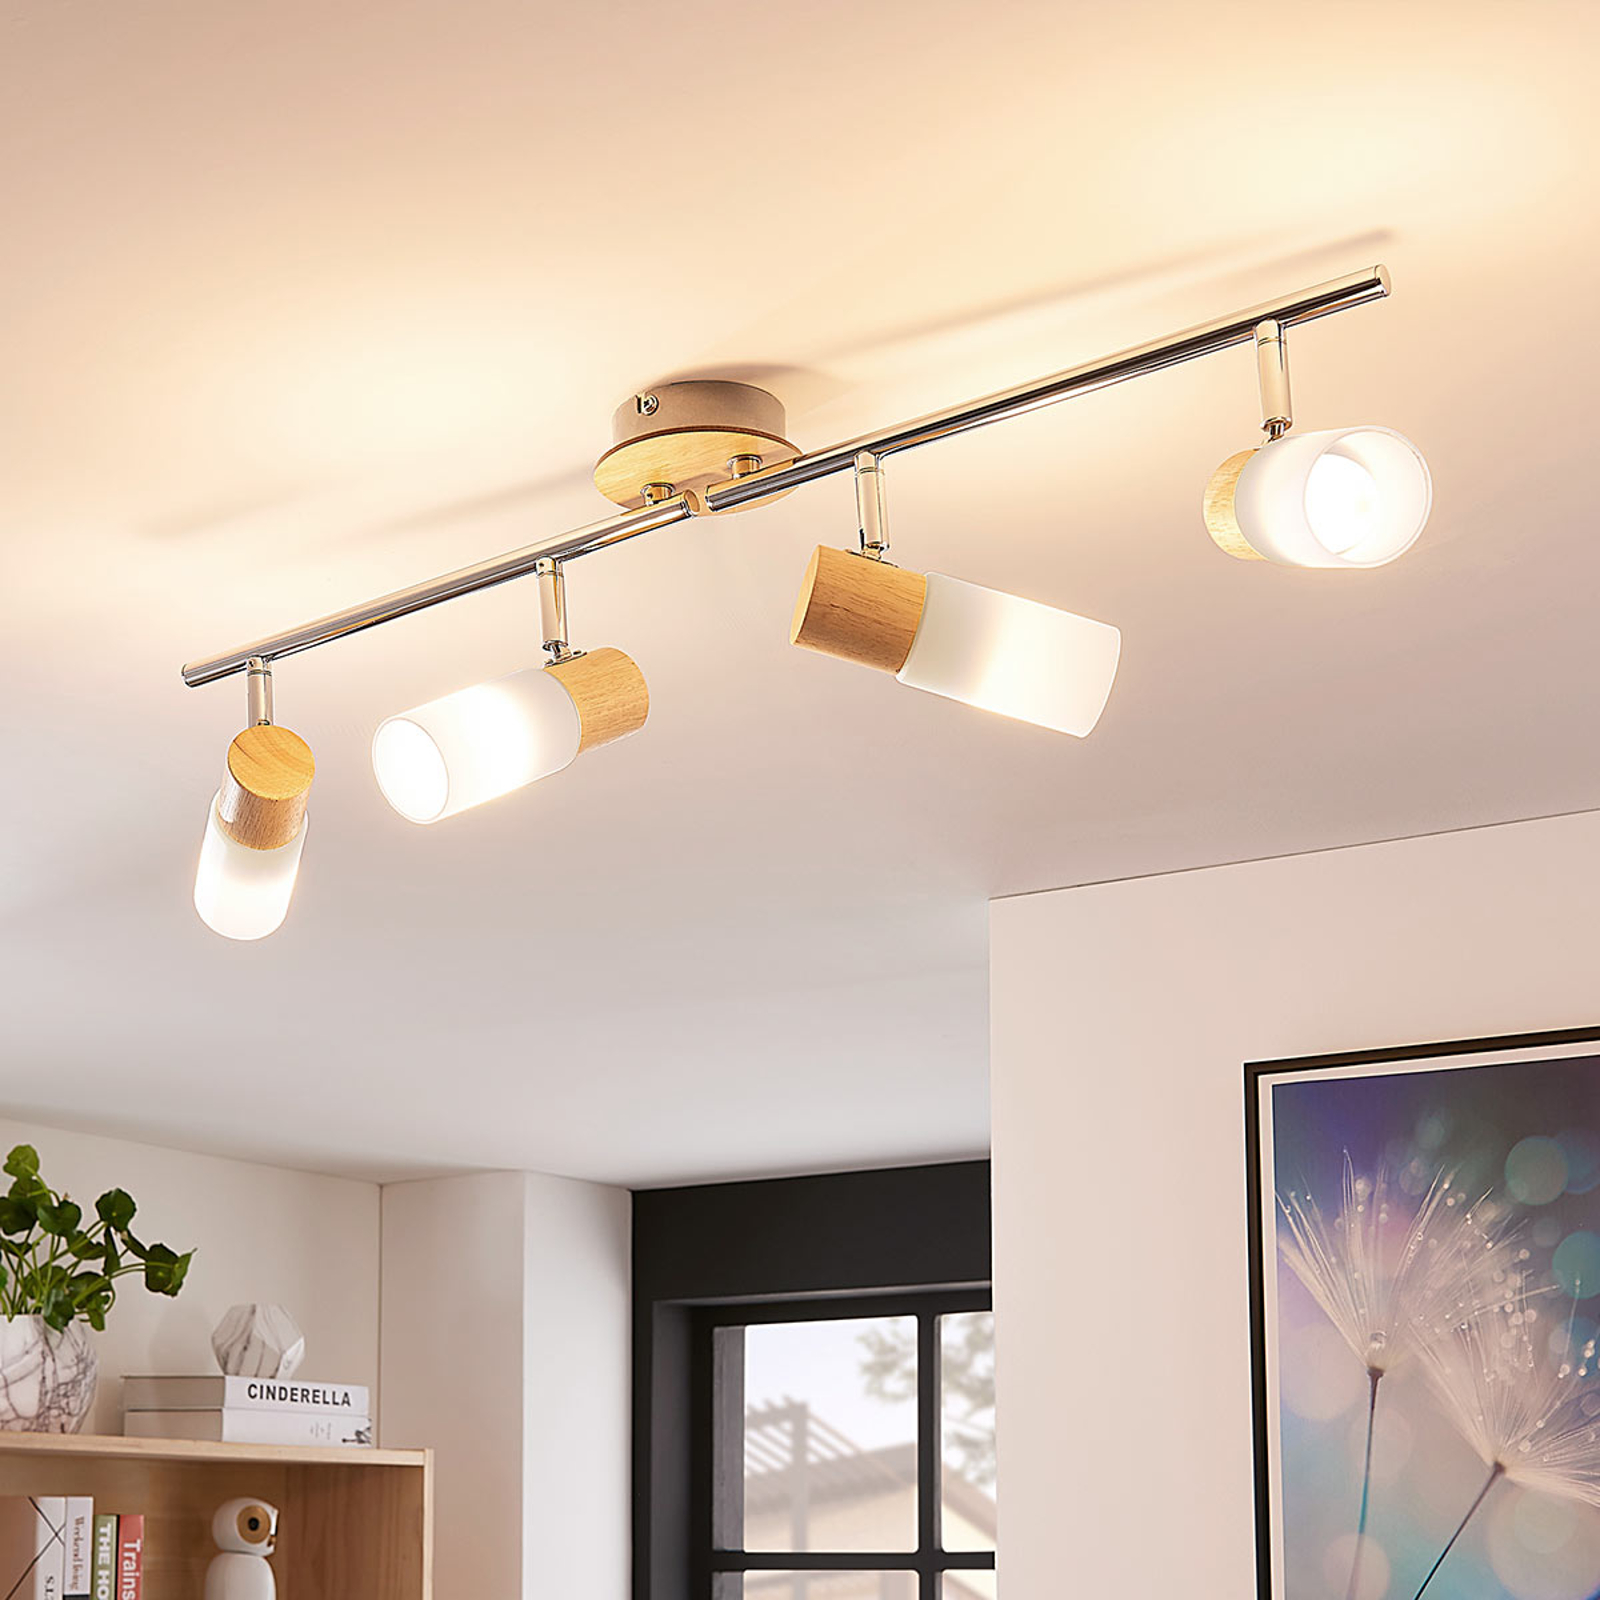 Plafonnier LED Christoph avec bois, 4 lampes